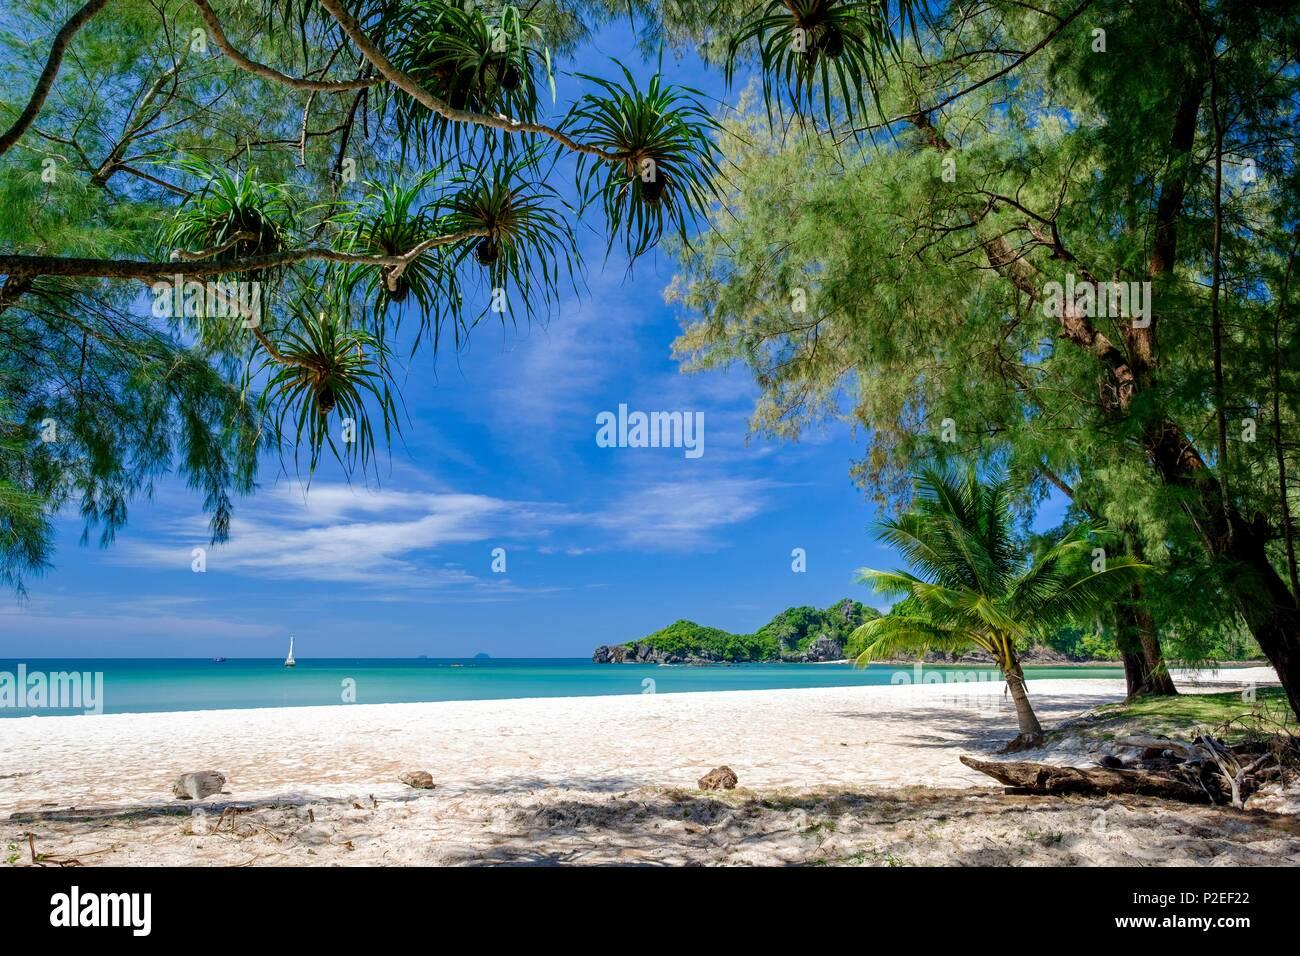 Thailandia, provincia di Satun, Tarutao National Marine Park, Ko Tarutao island, Ao Pante Malacca beach Immagini Stock